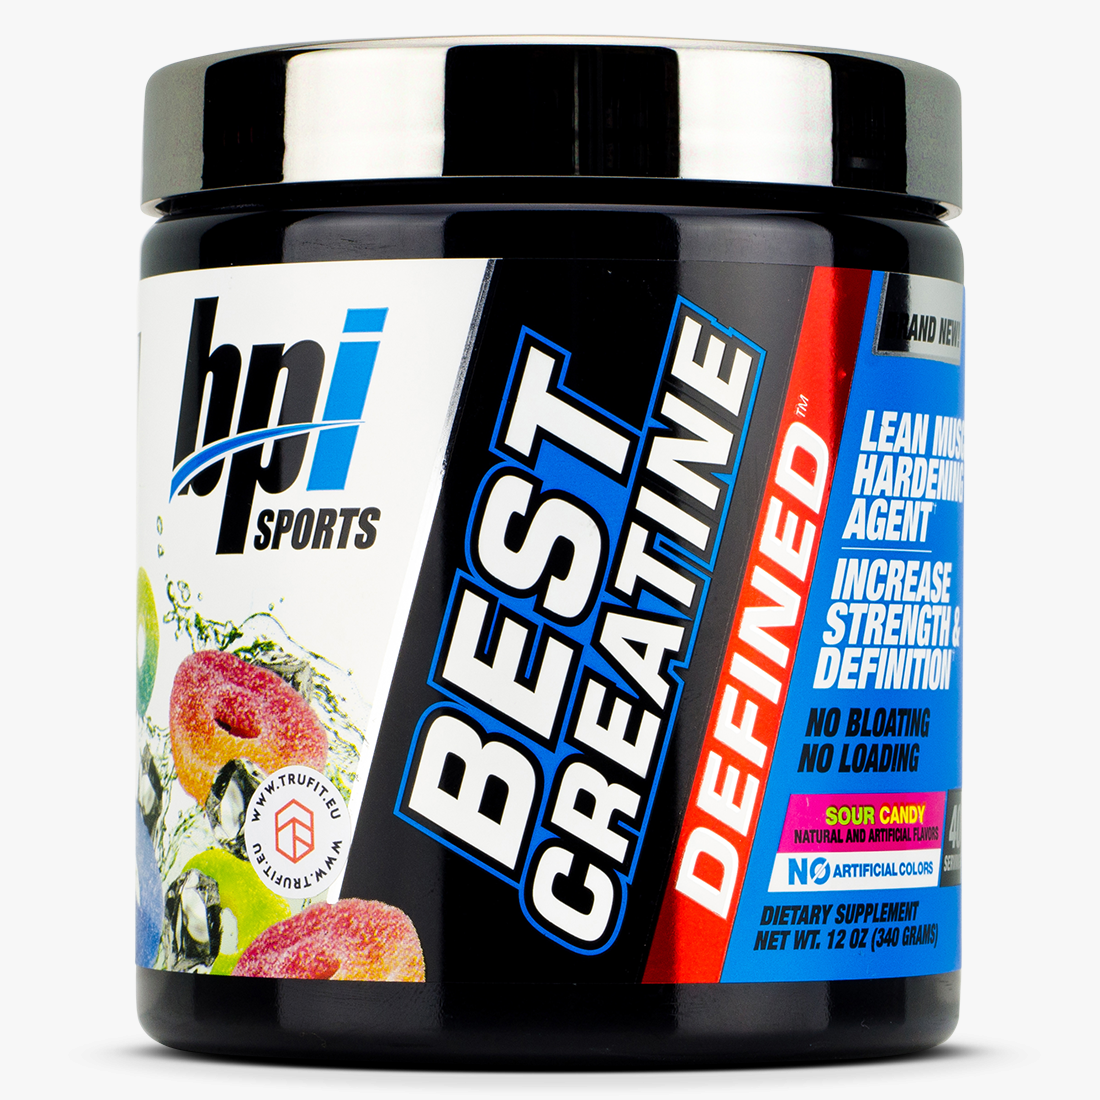 BPI Sports - Best Creatine Defined